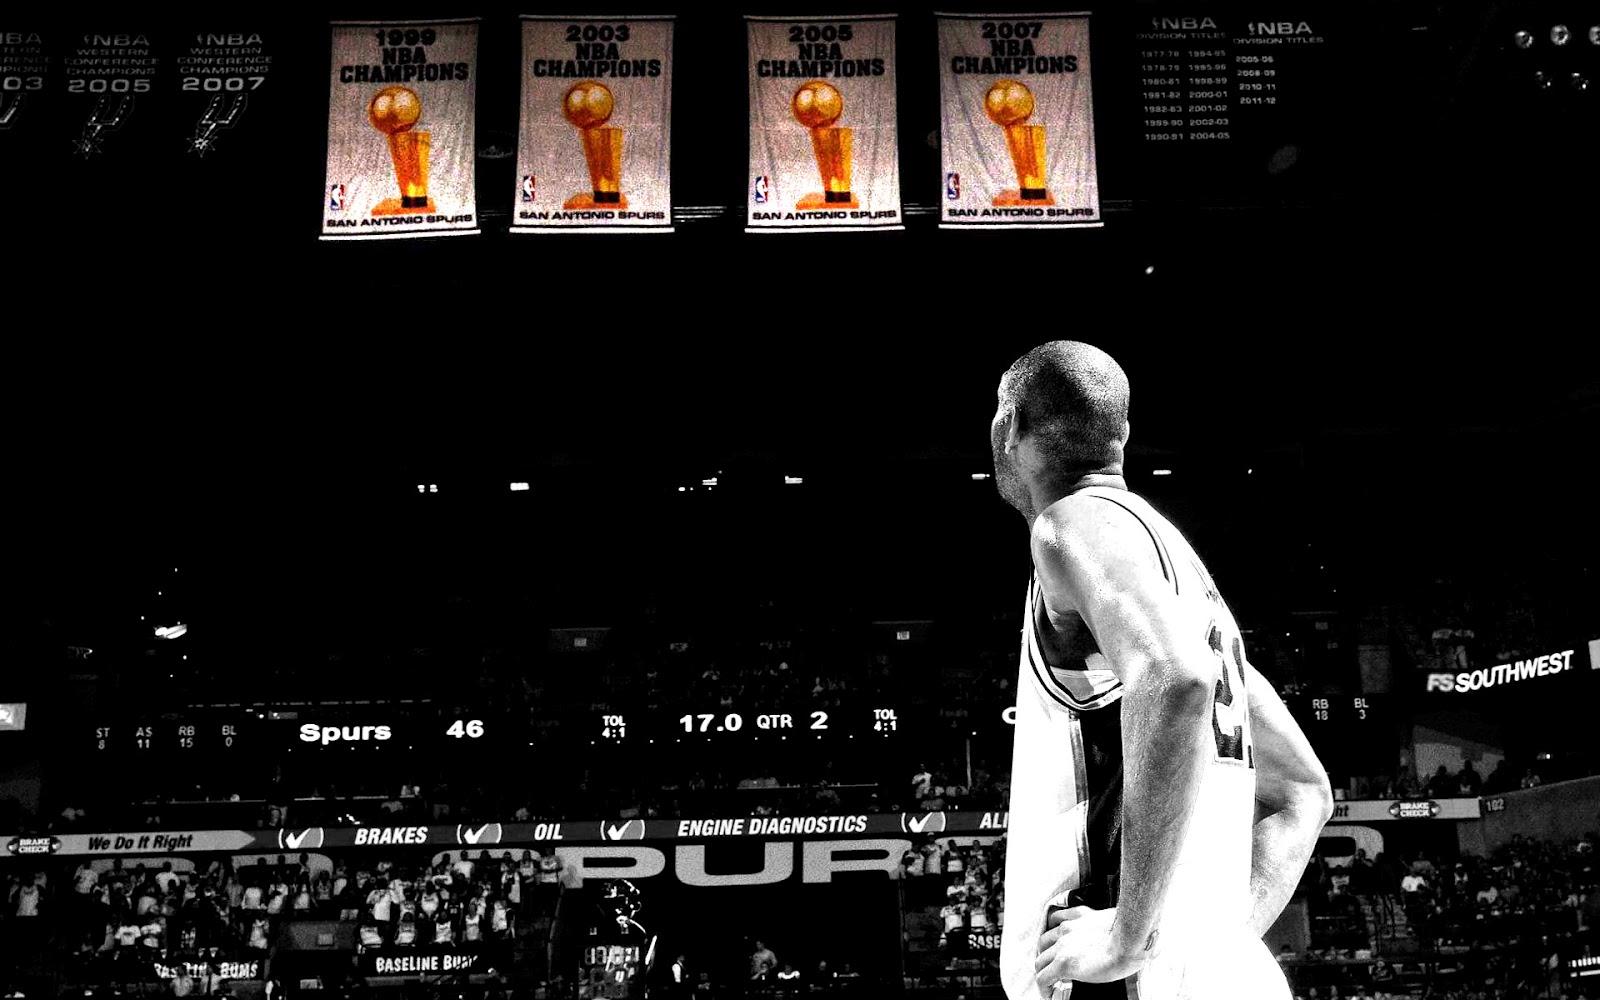 Tim Duncan Spurs Championship Banners 1920x1200 Wallpaper ...